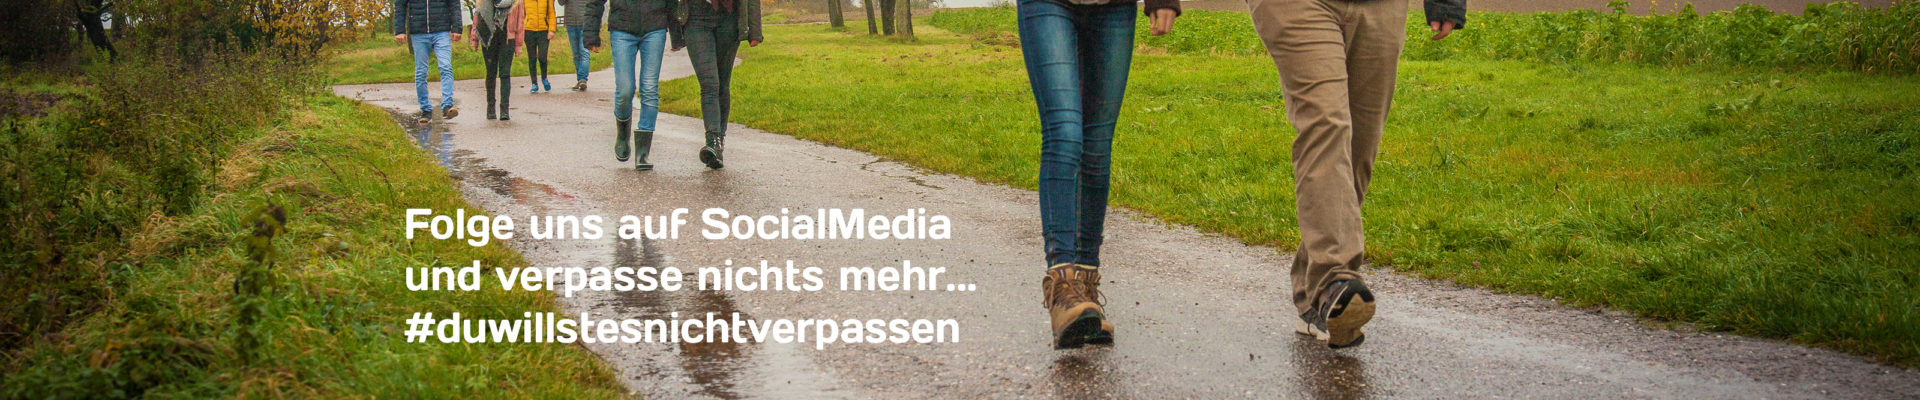 Folge uns auf SocialMedia!